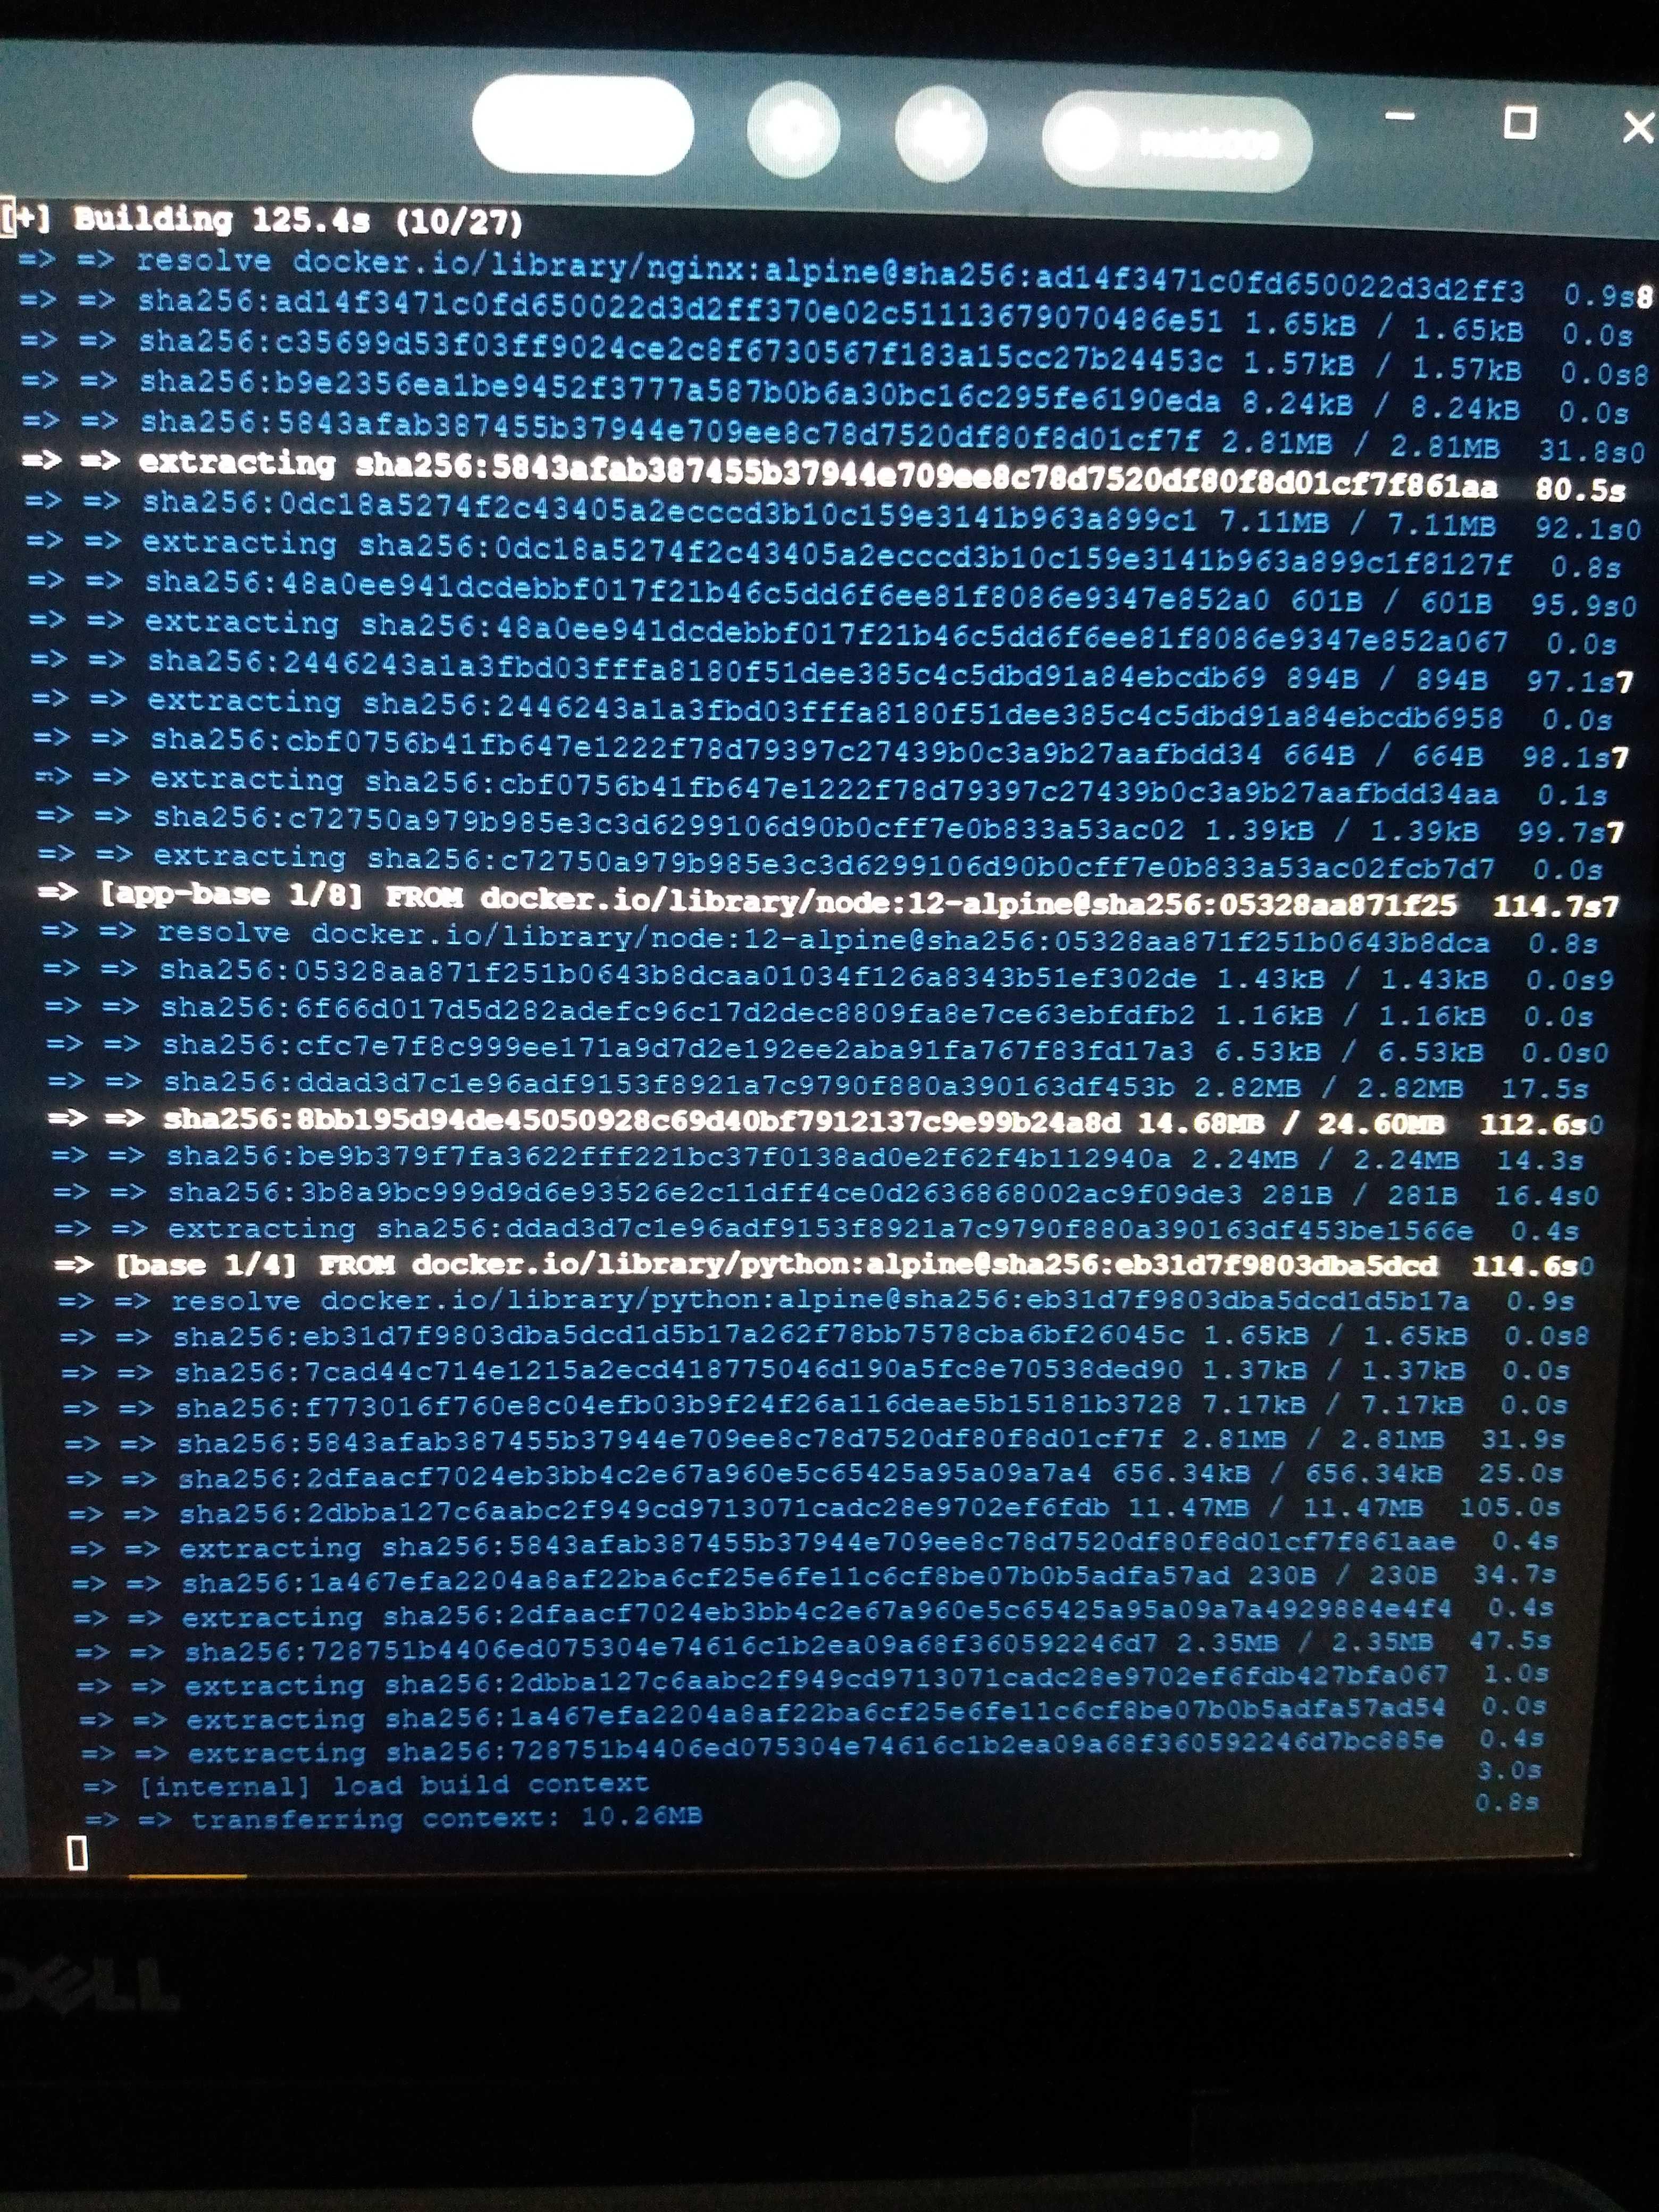 https://cloud-pq4vjjf5e-hack-club-bot.vercel.app/0img_20210730_223232.jpg